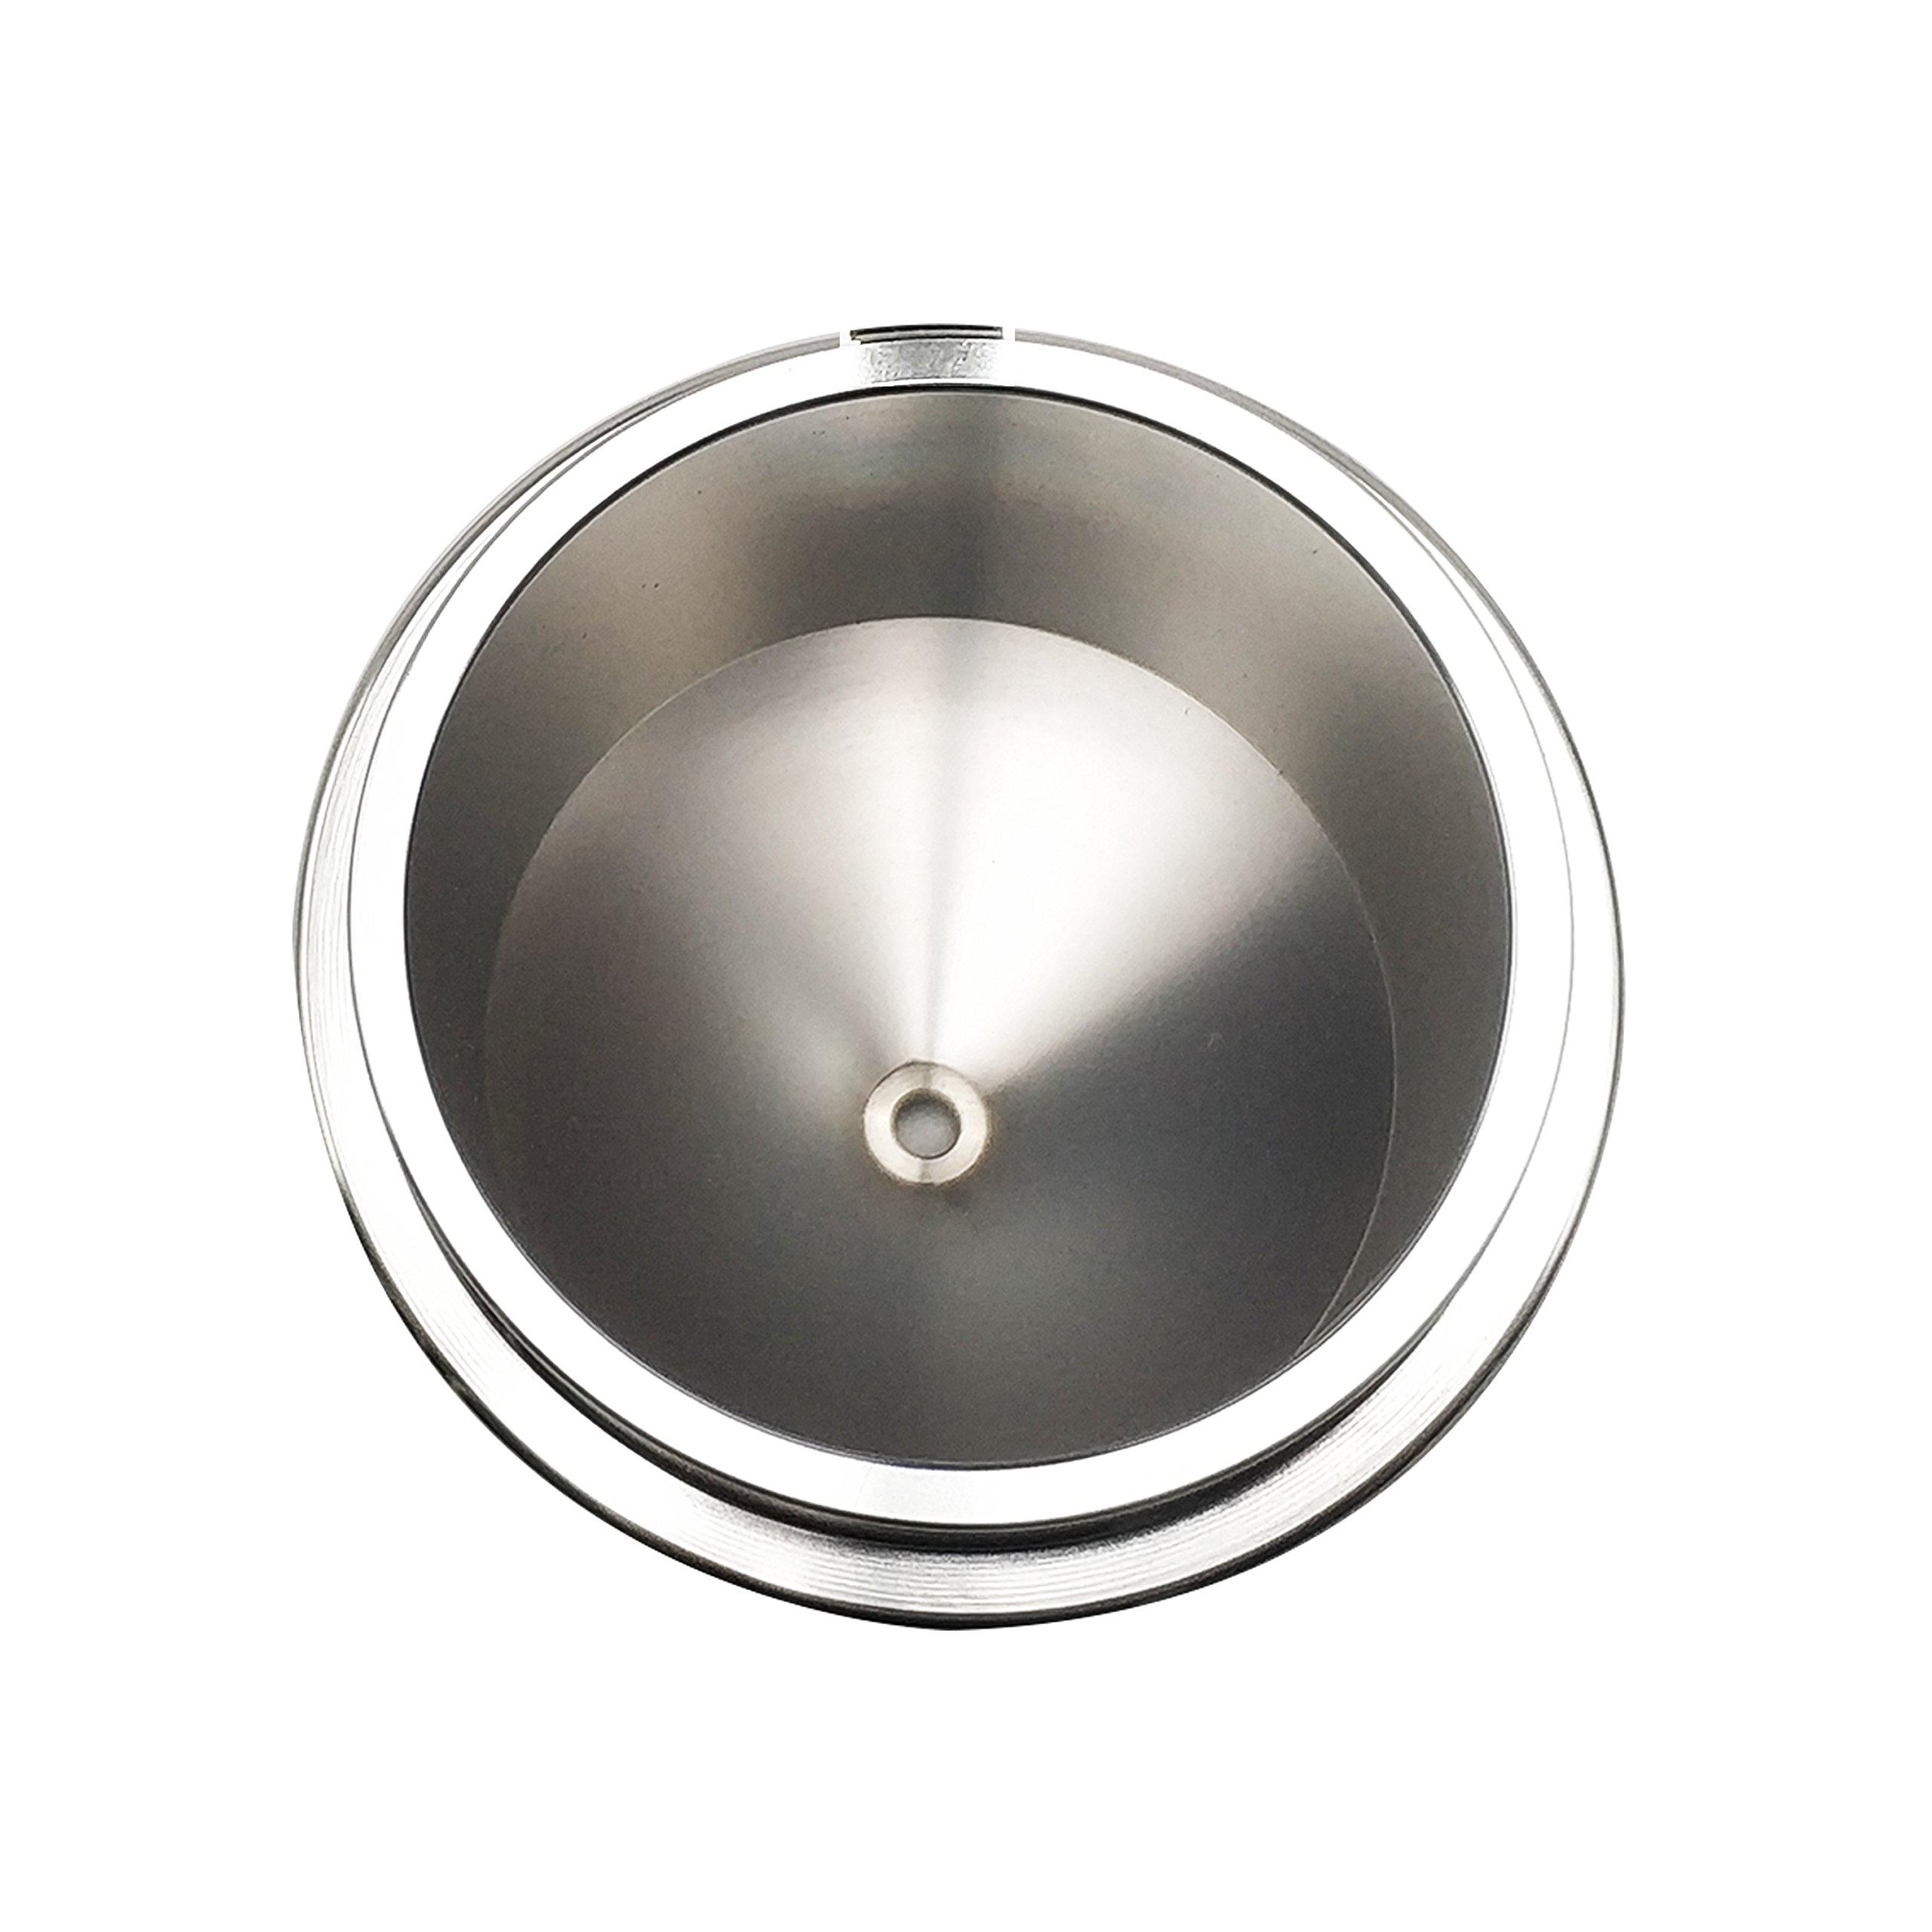 BAOSHISHAN PUSHEN Viscosity Cup 4mm Portable Aluminum DIN Immersion Viscosity Measuring Cup Din 4 Viscosity Cup According to DIN 53 211 by BAOSHISHAN